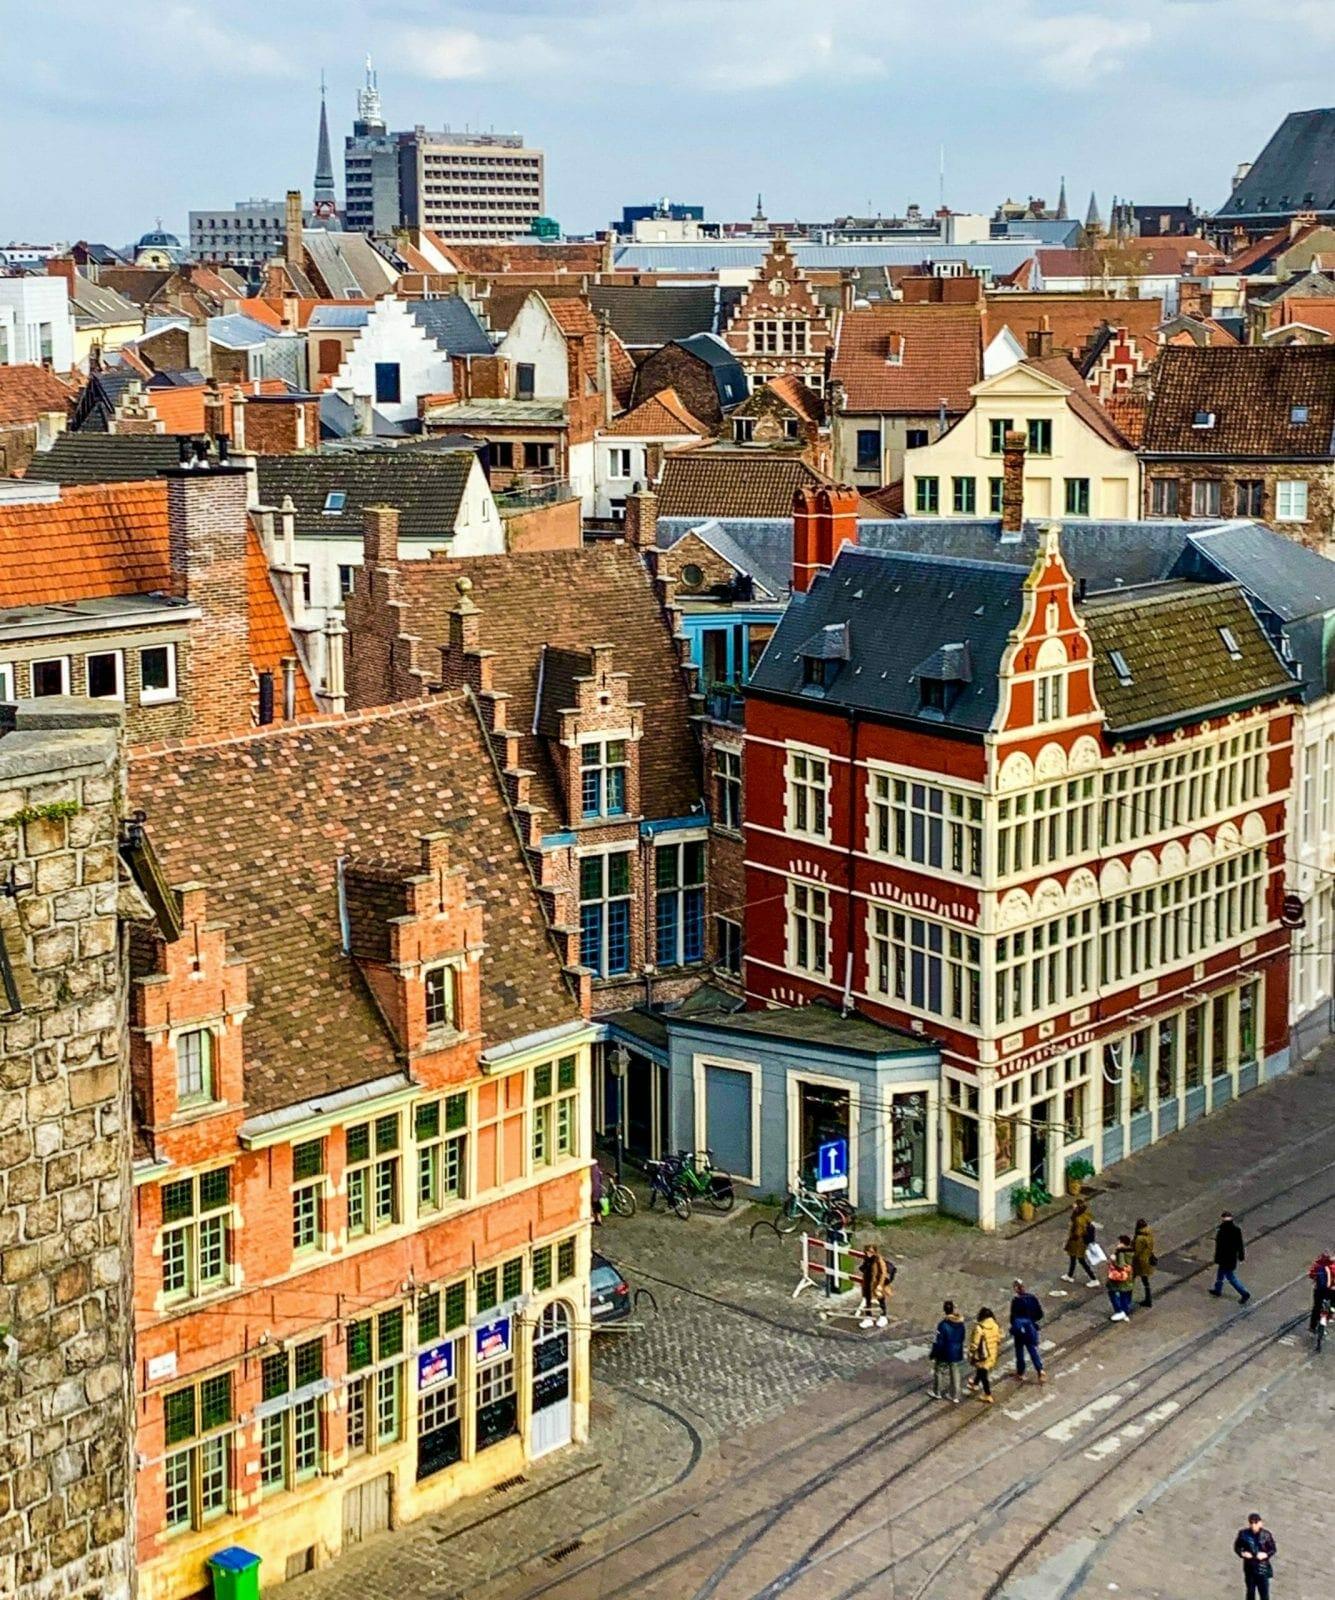 Wandering in Ghent